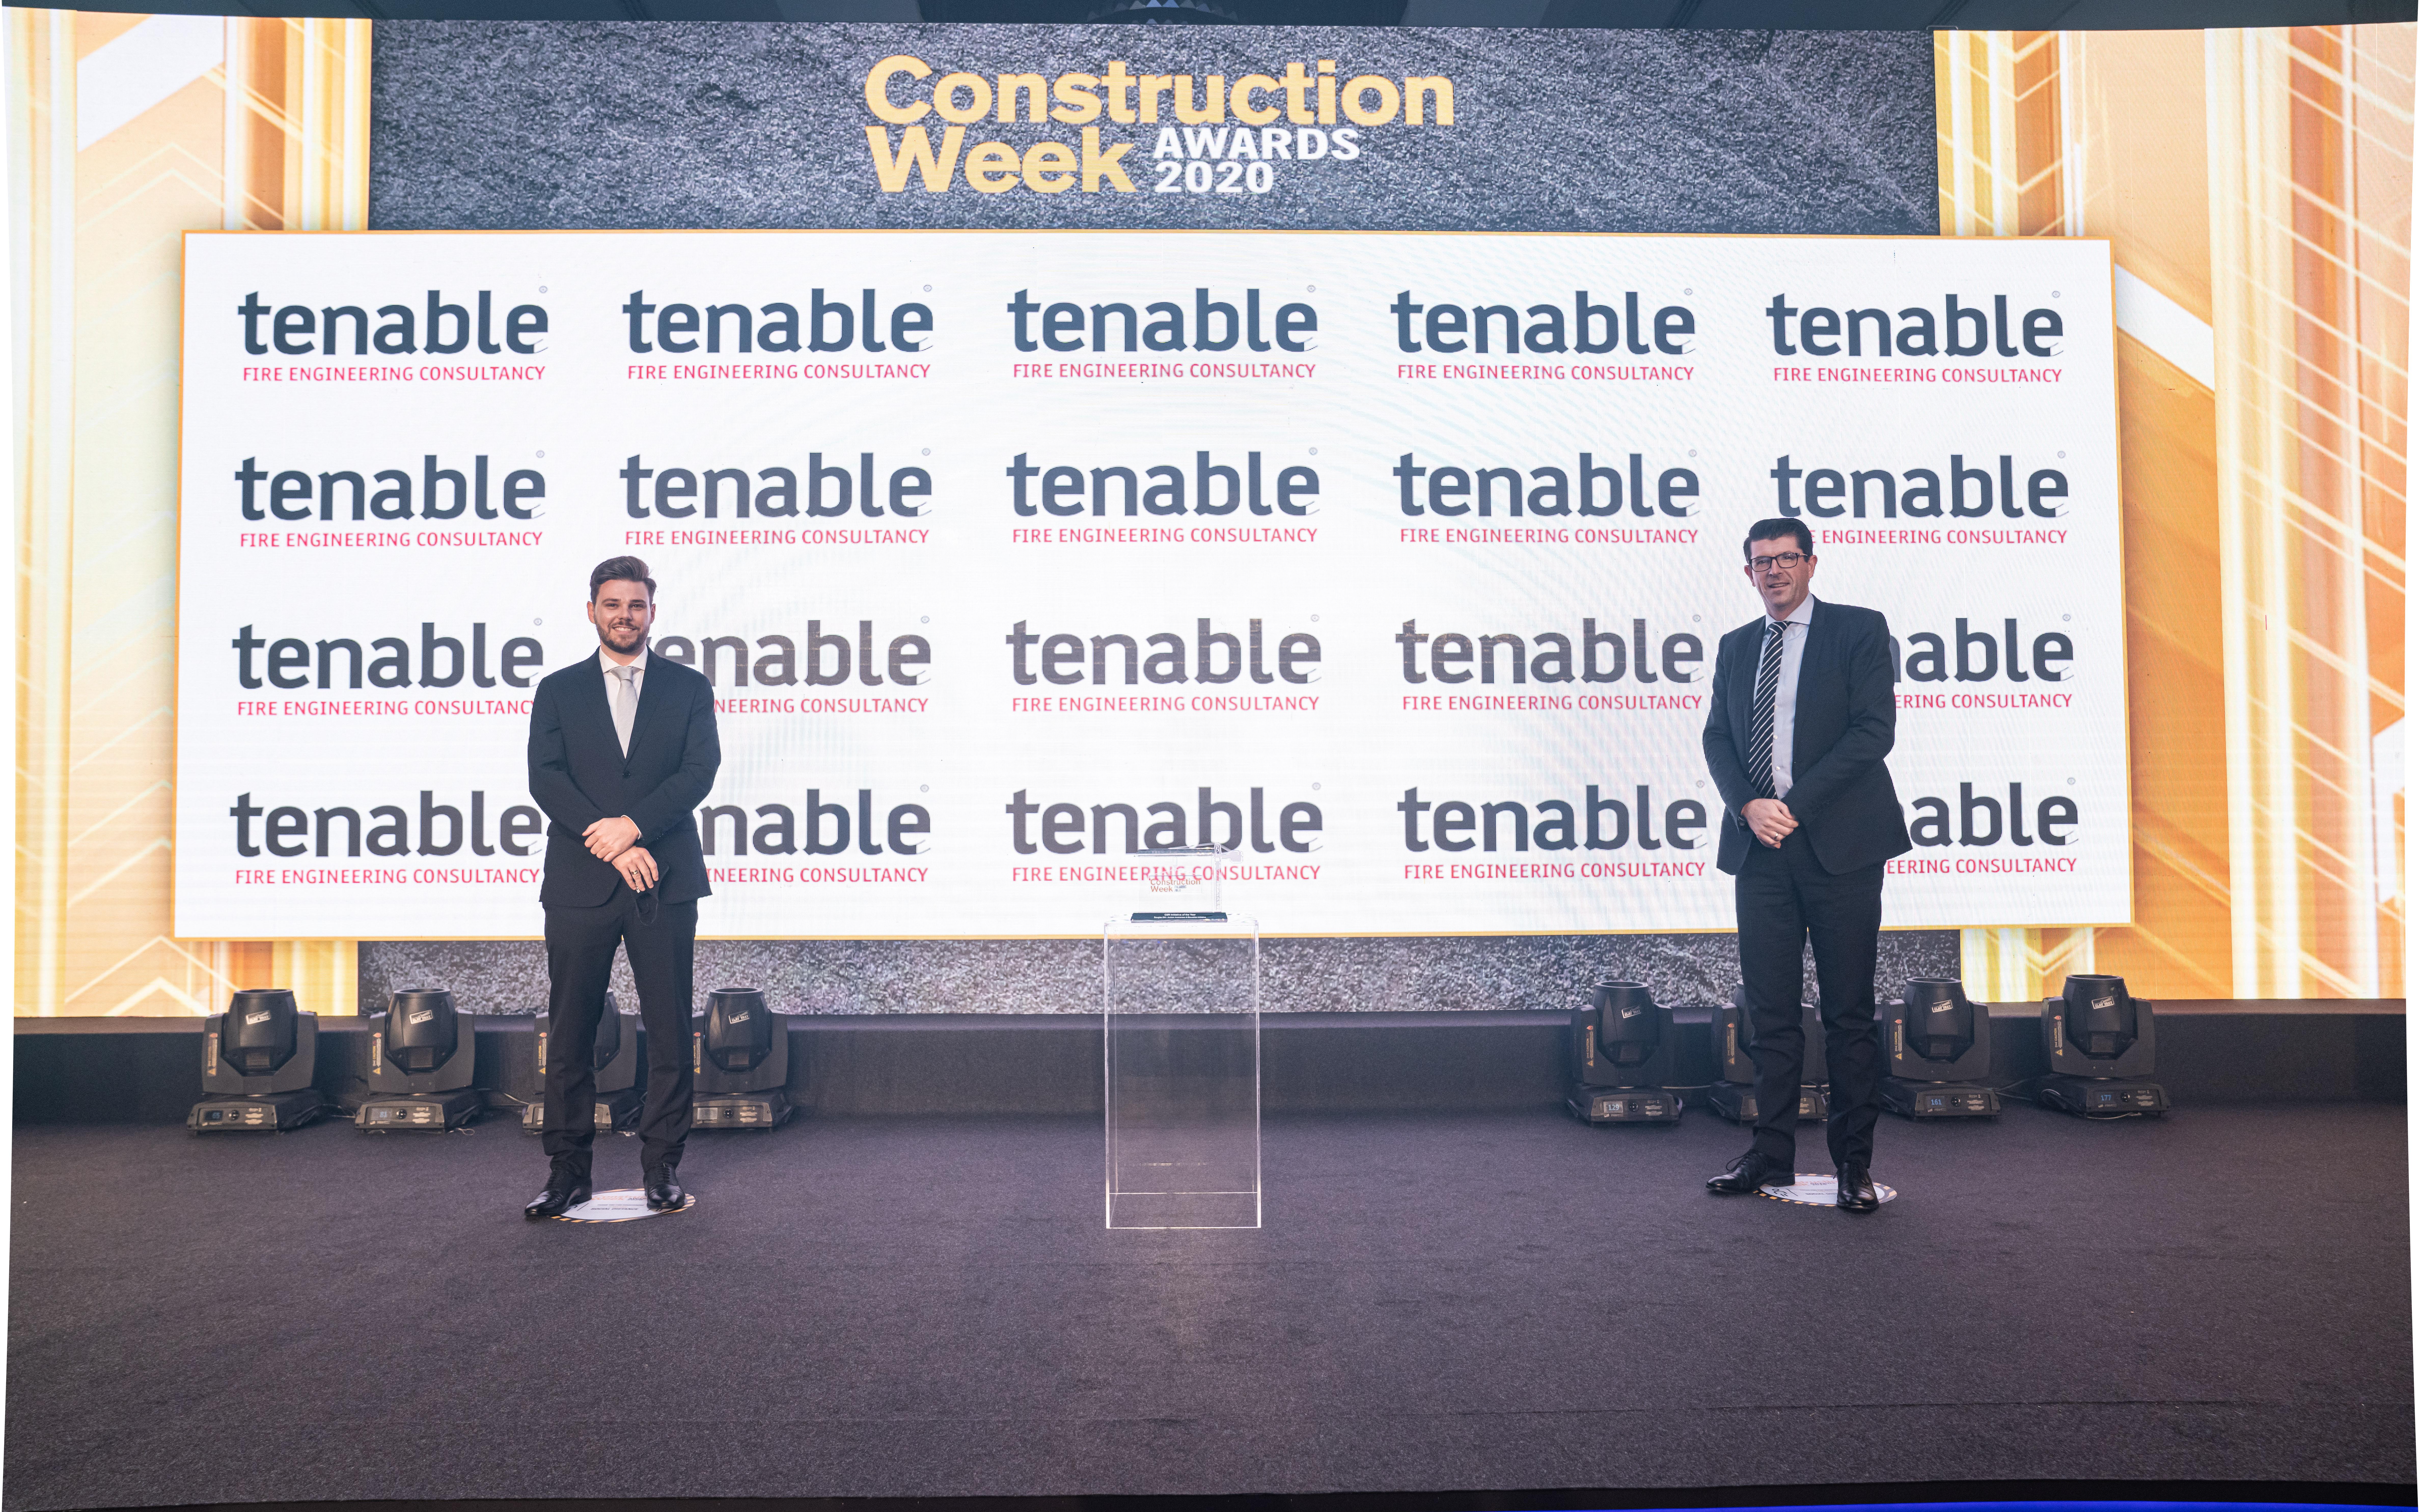 Construction Week Awards 2020